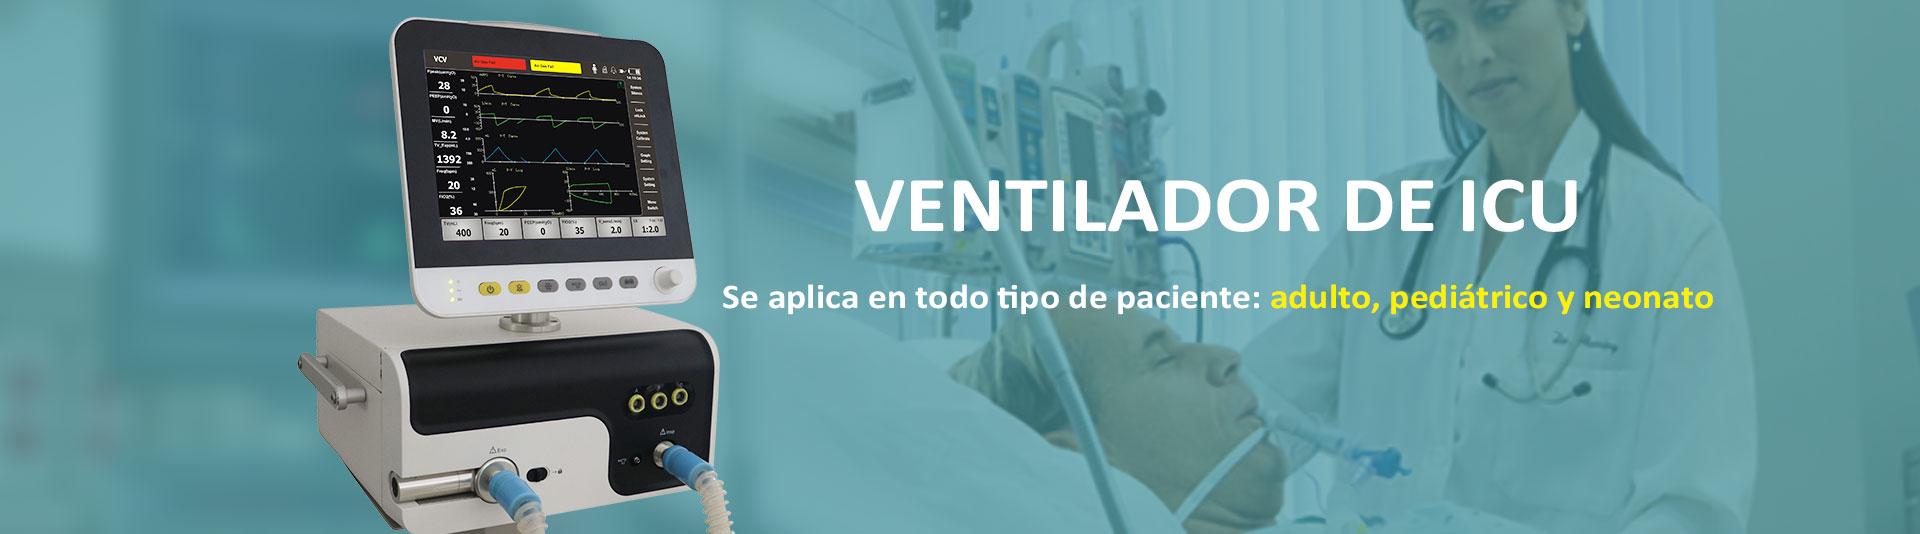 Ventilador de ICU